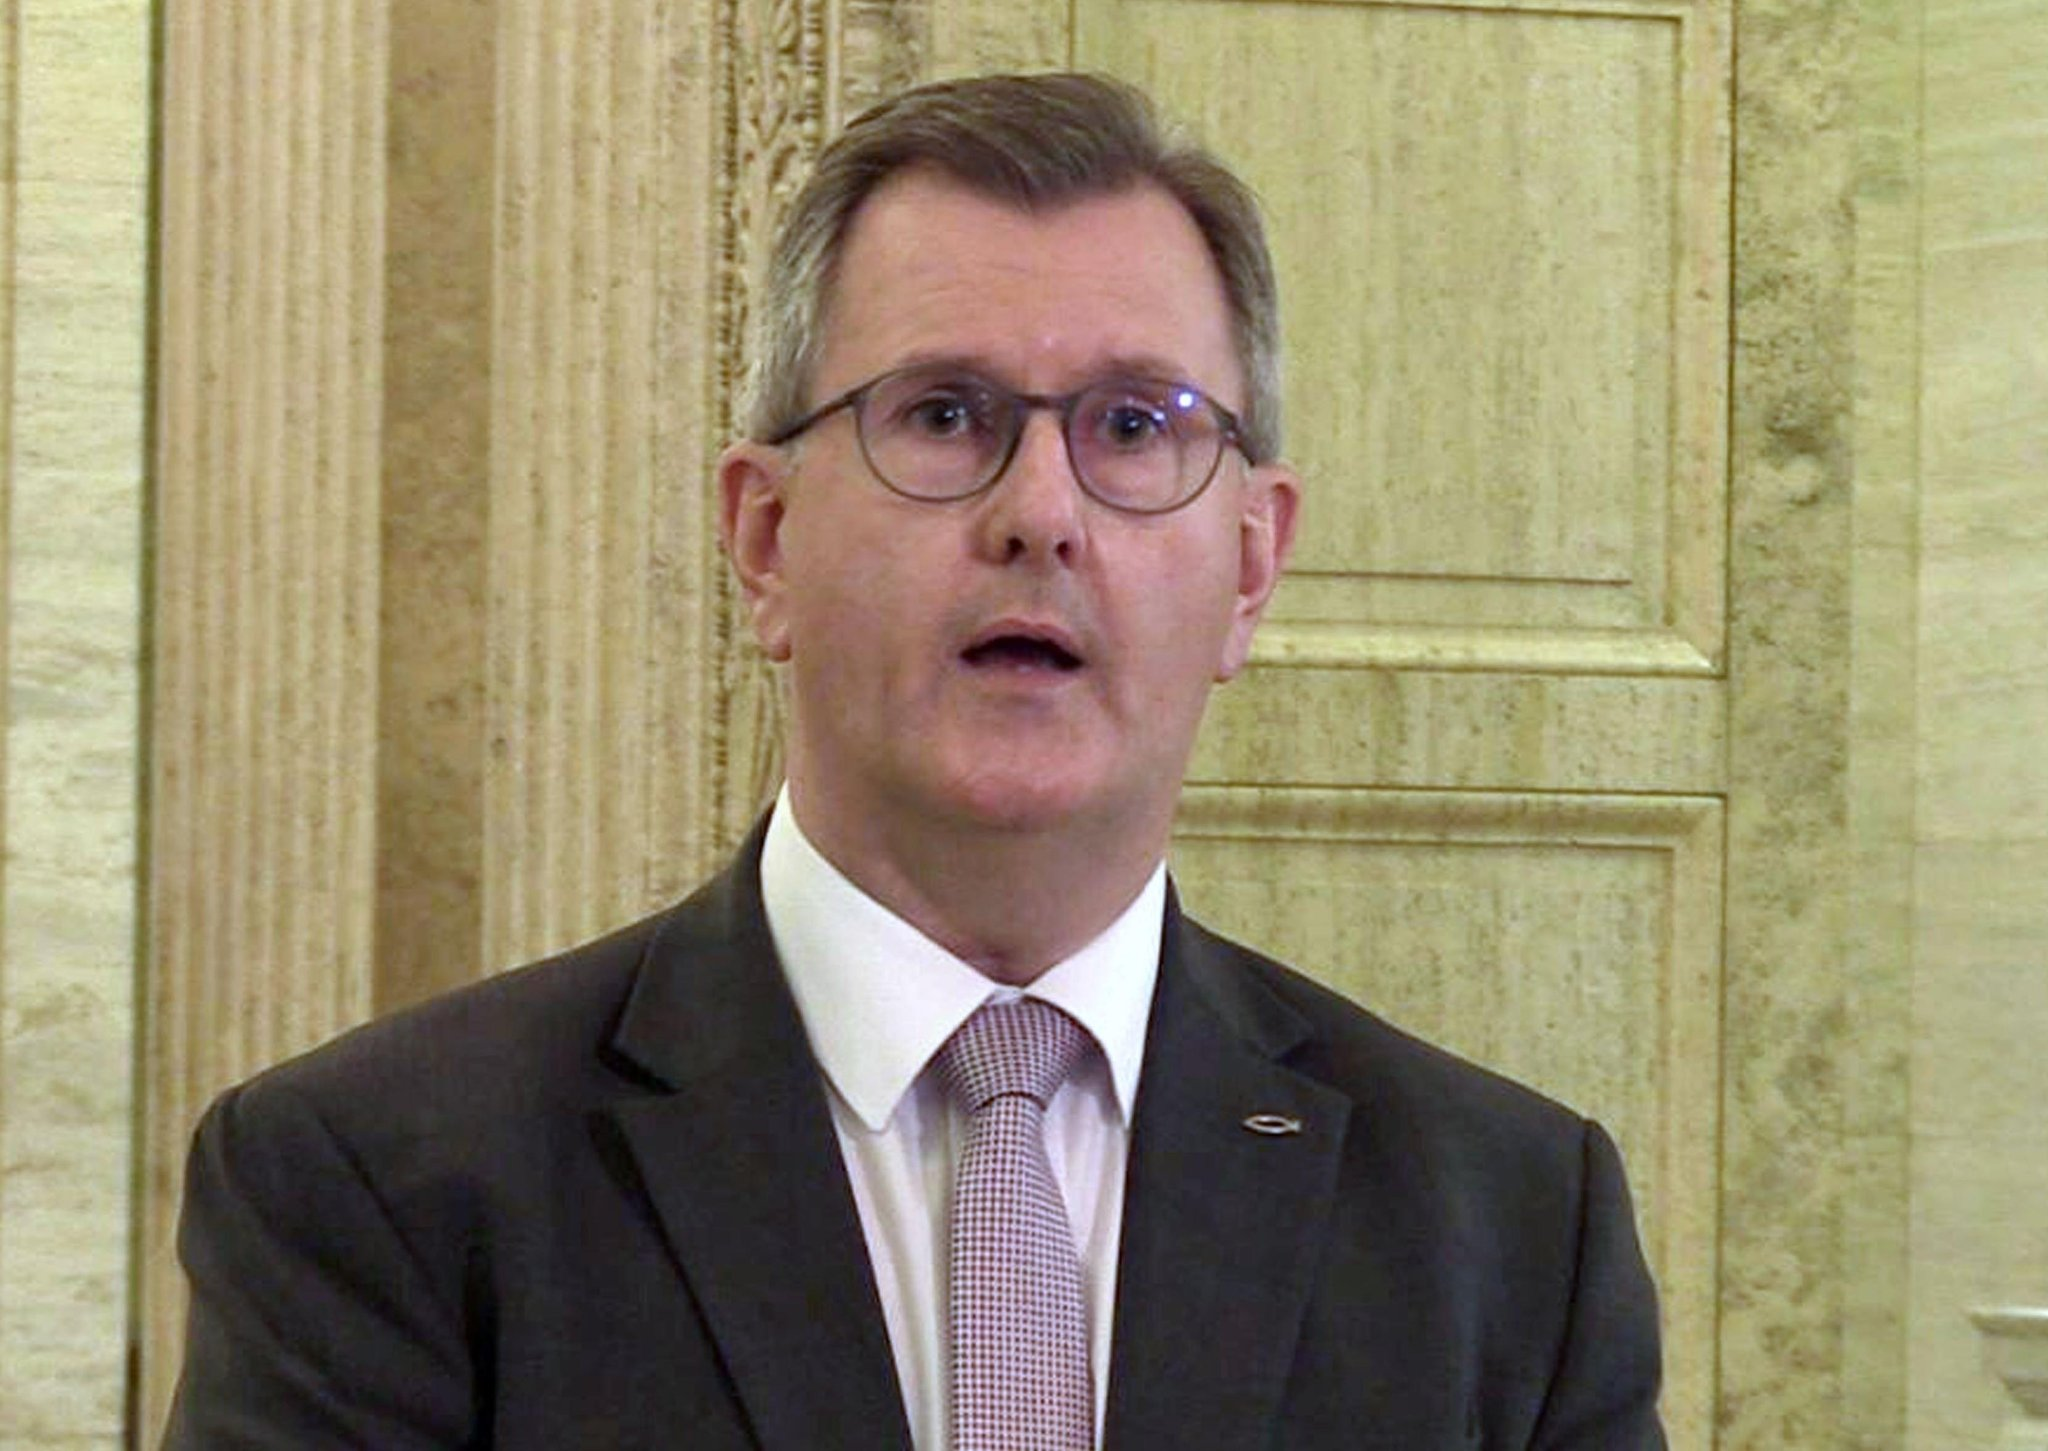 'Sinn Fein determined to start culture war with unionism': Sir Jeffrey Donaldson